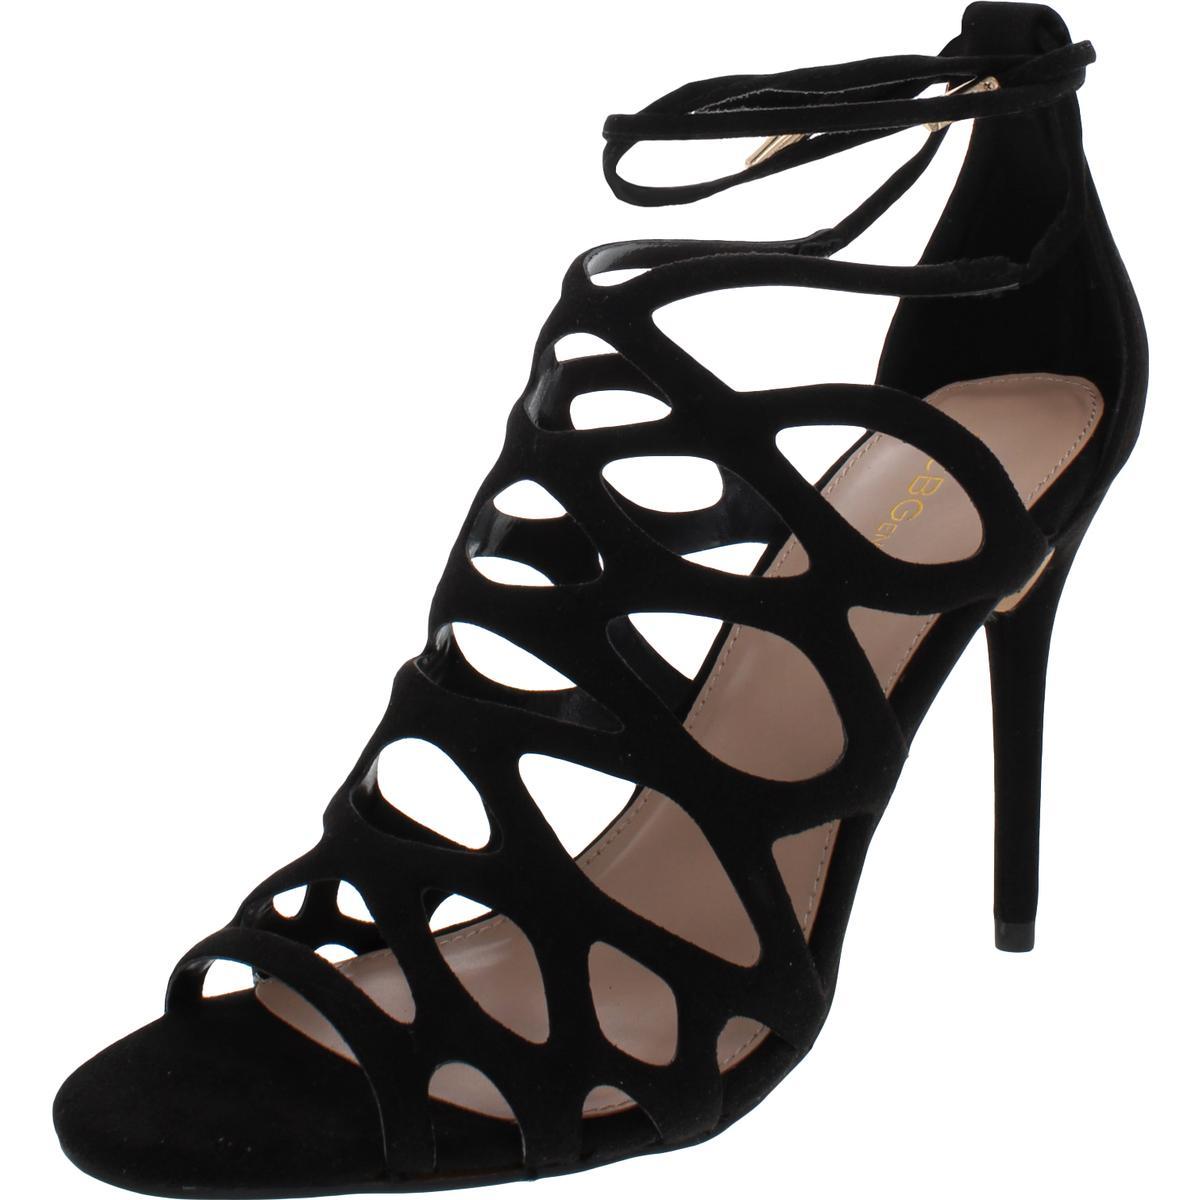 BCBGeneration-Womens-Joanna-Metallic-Caged-Dress-Sandals-Shoes-BHFO-8380 thumbnail 4